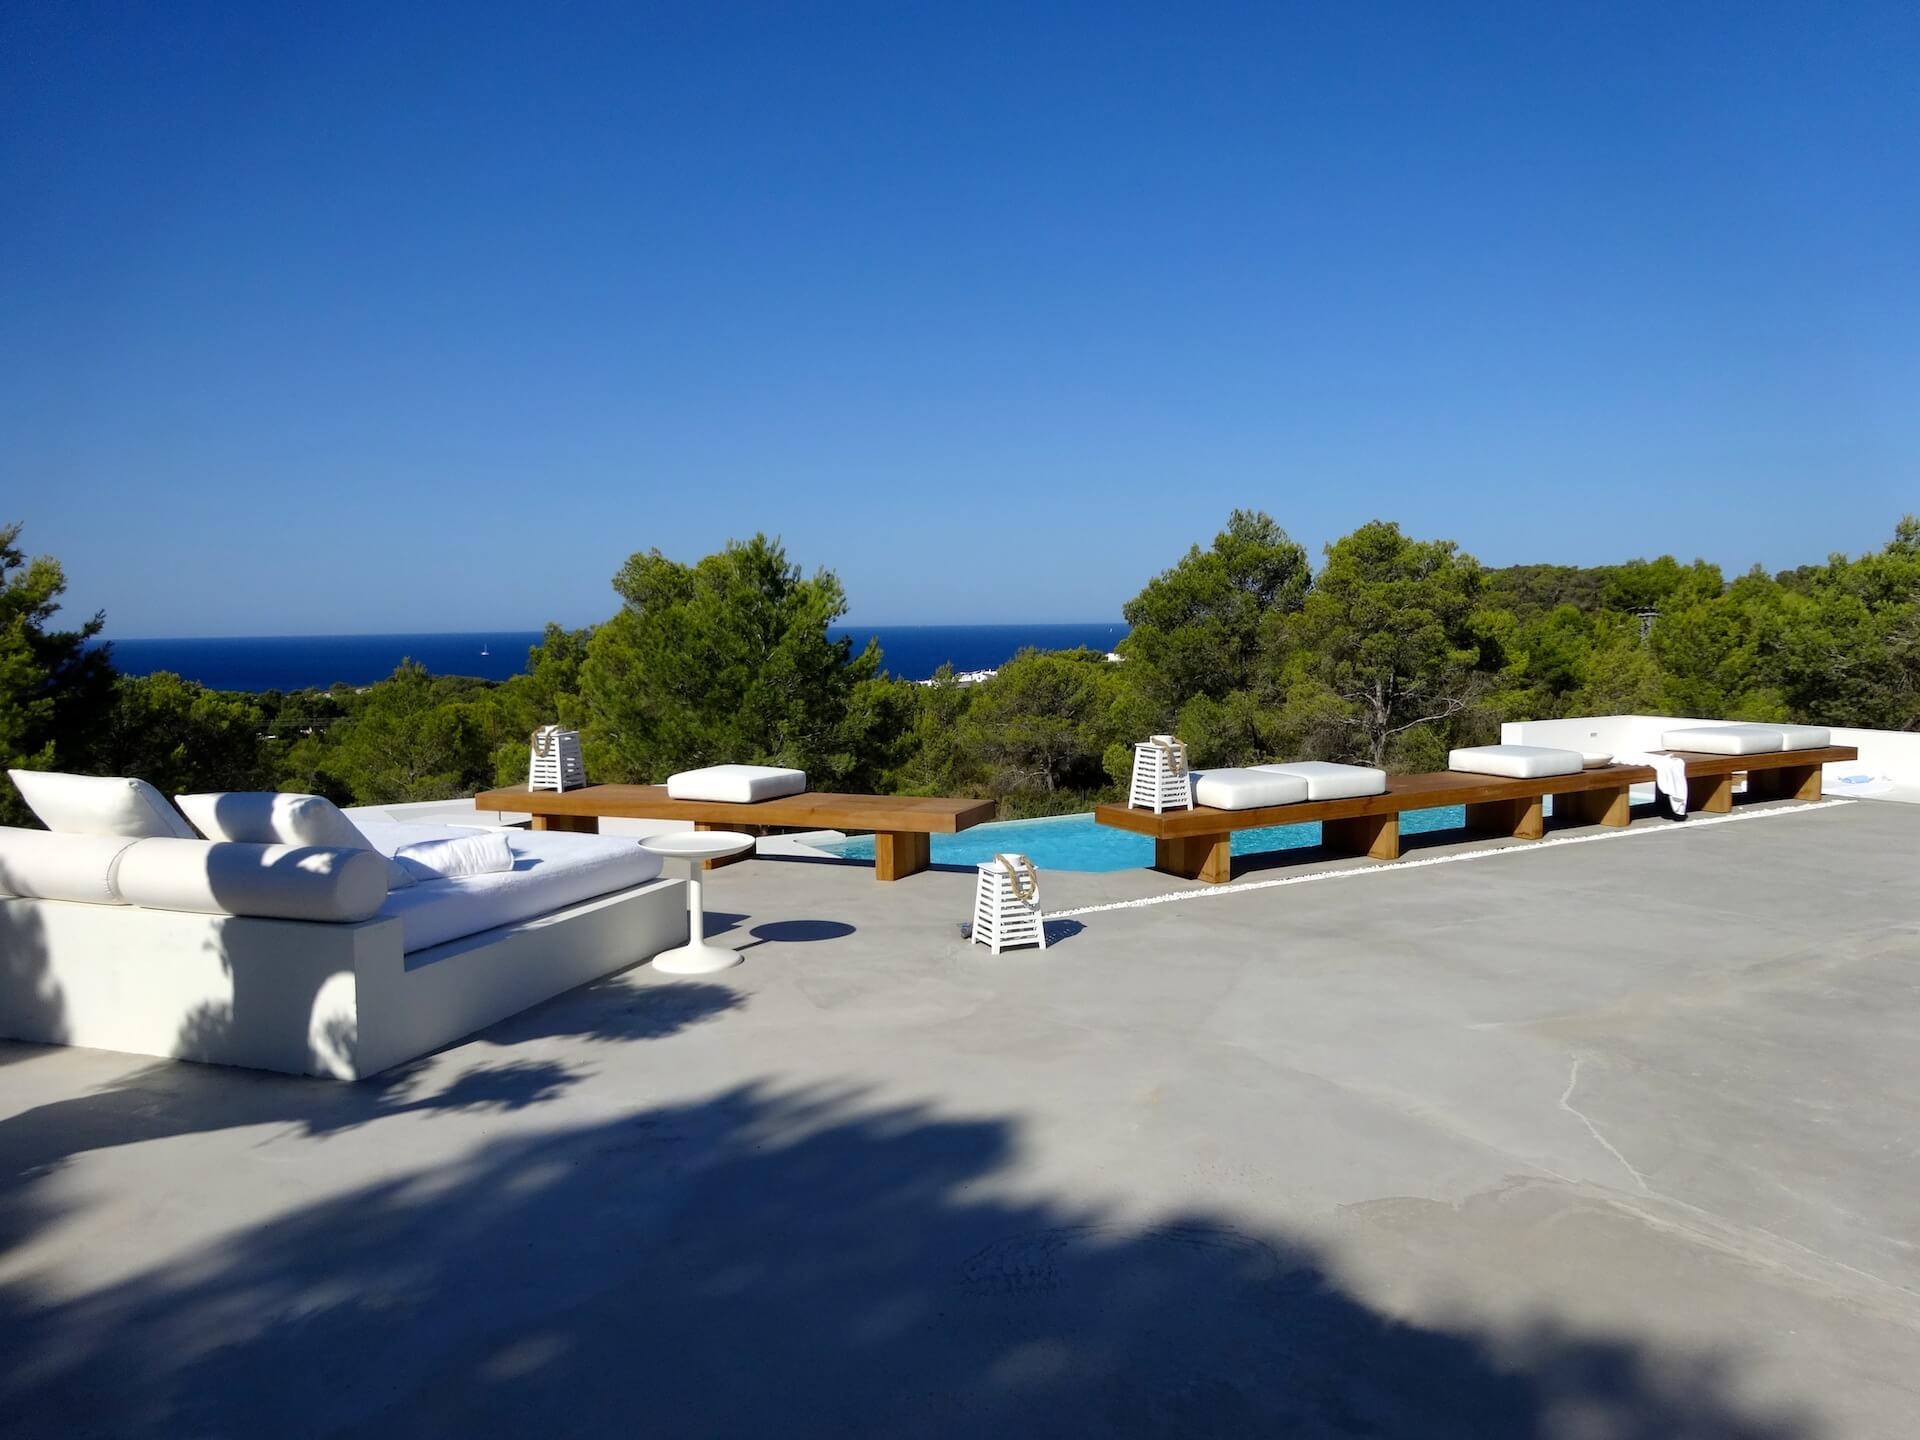 Rent A Car Ibiza Cala Tarida